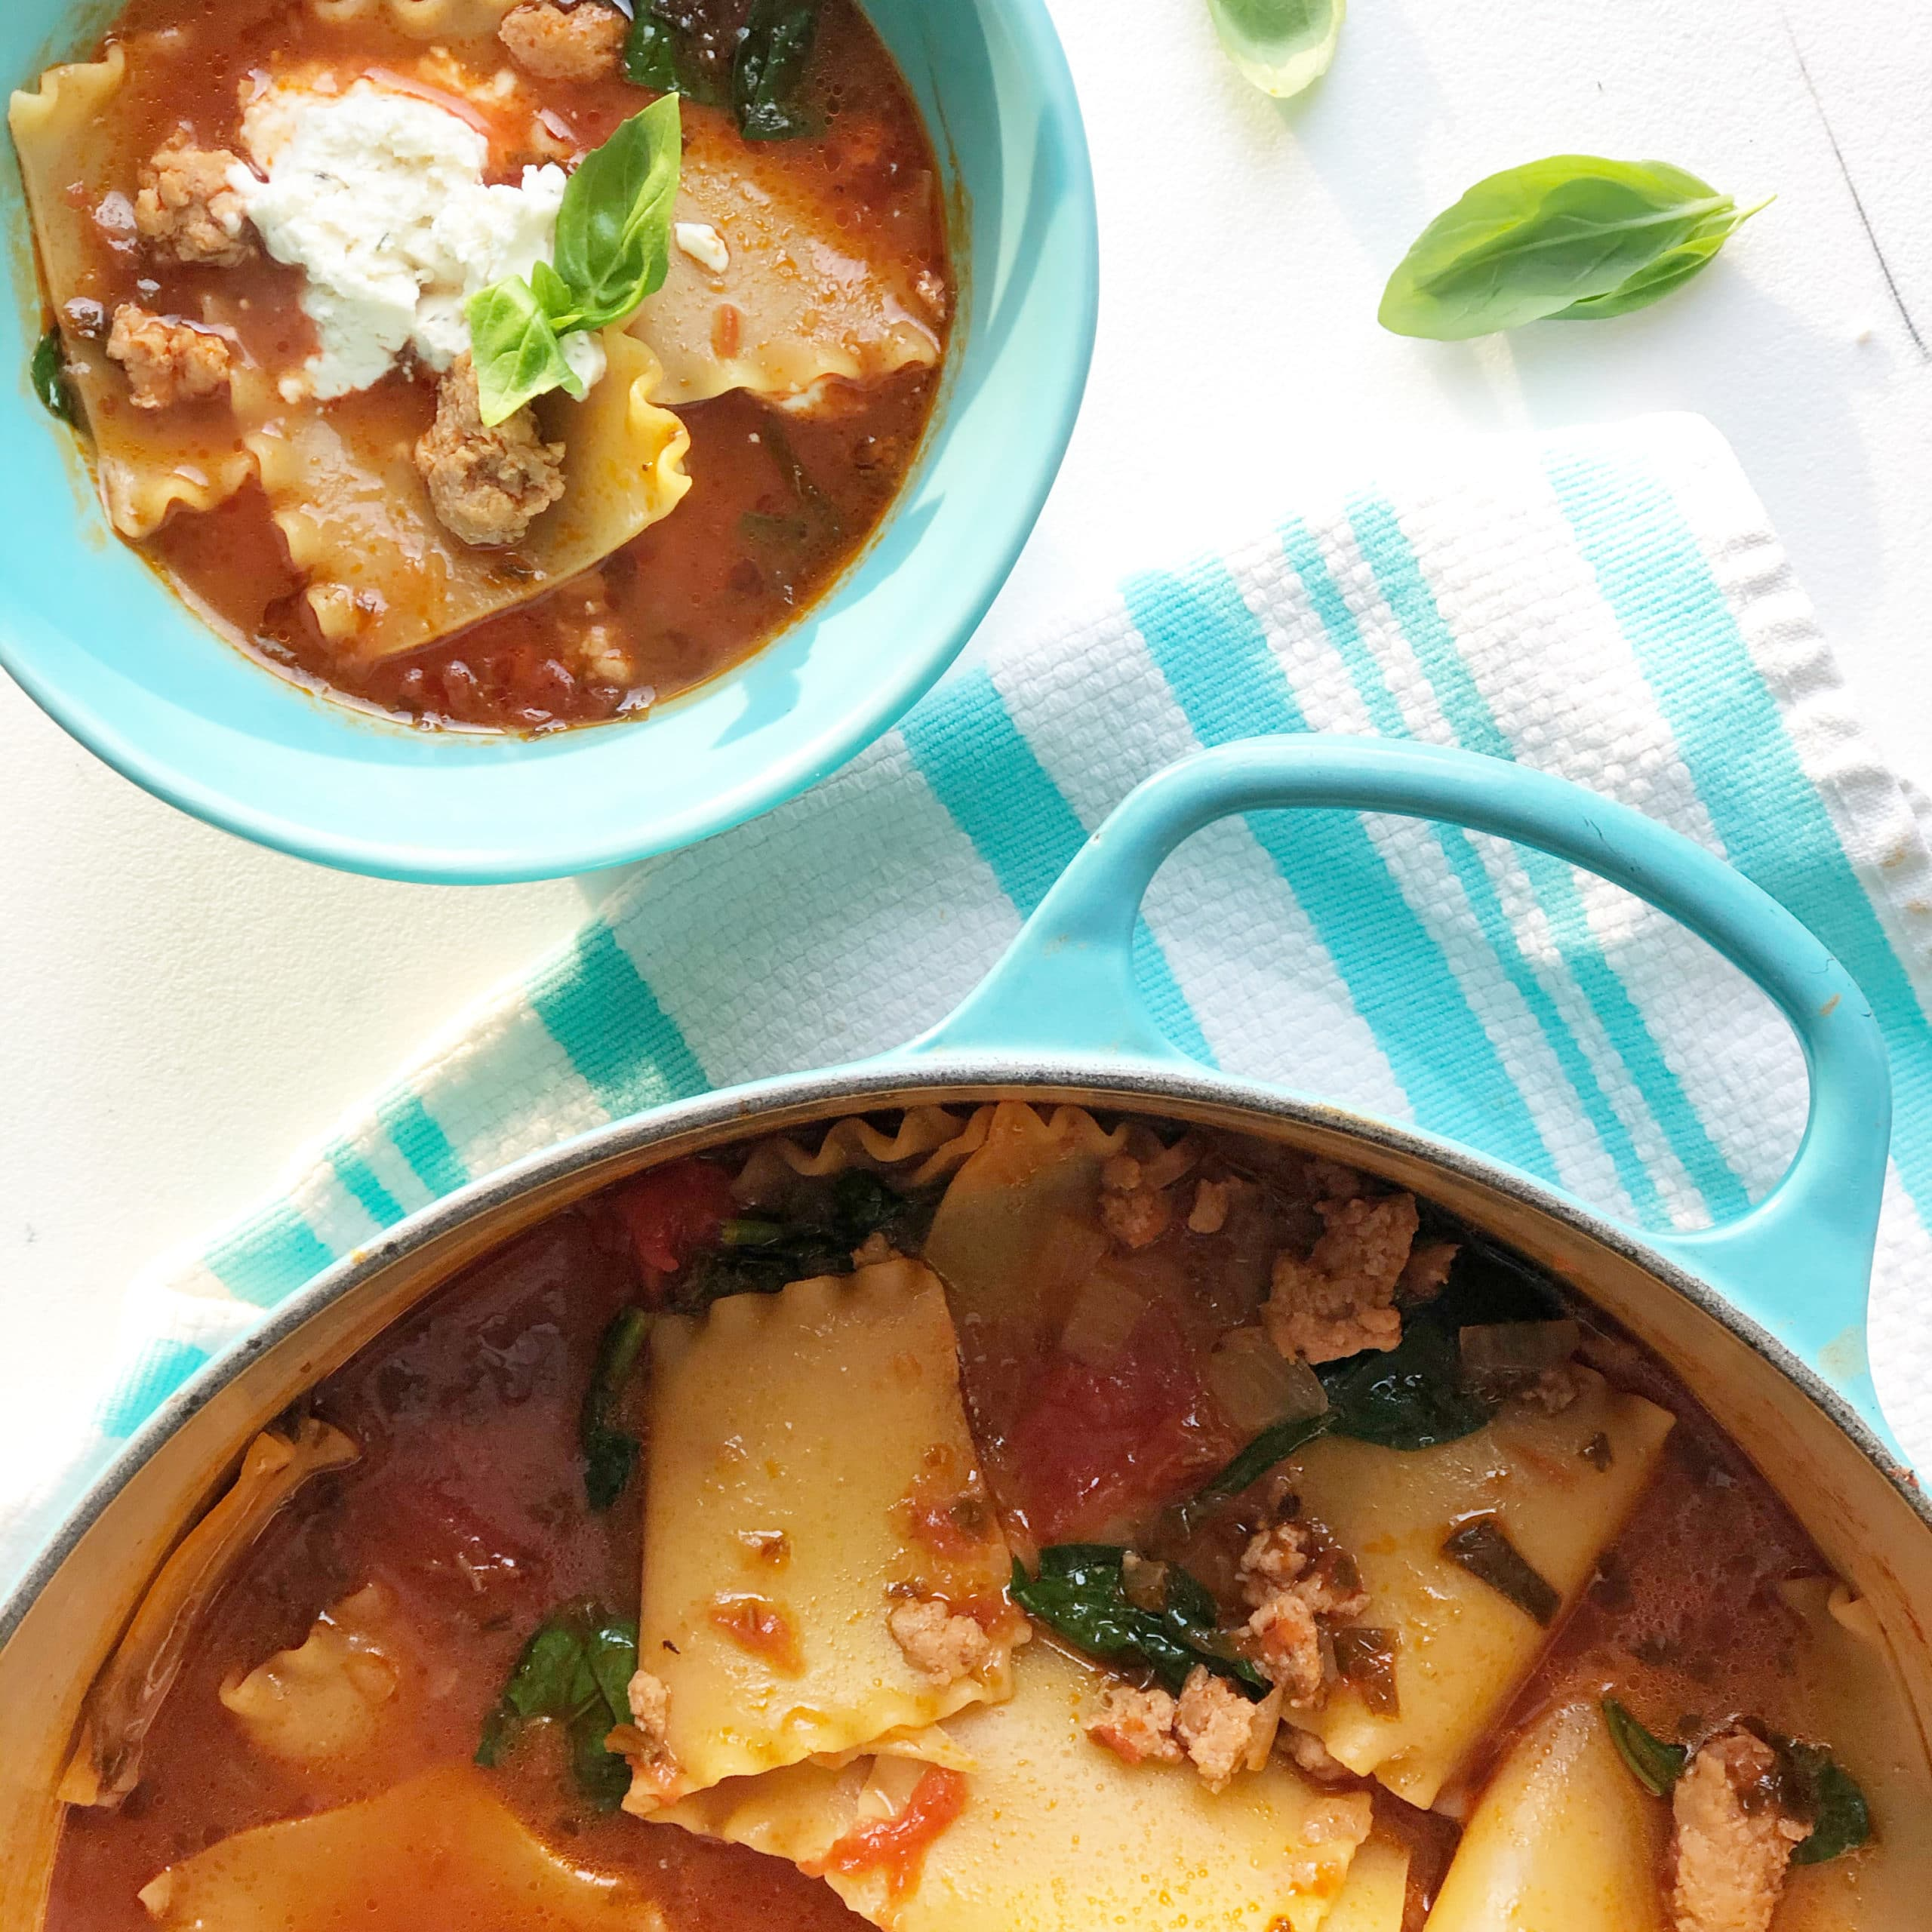 lasagna soup in a blue bowl